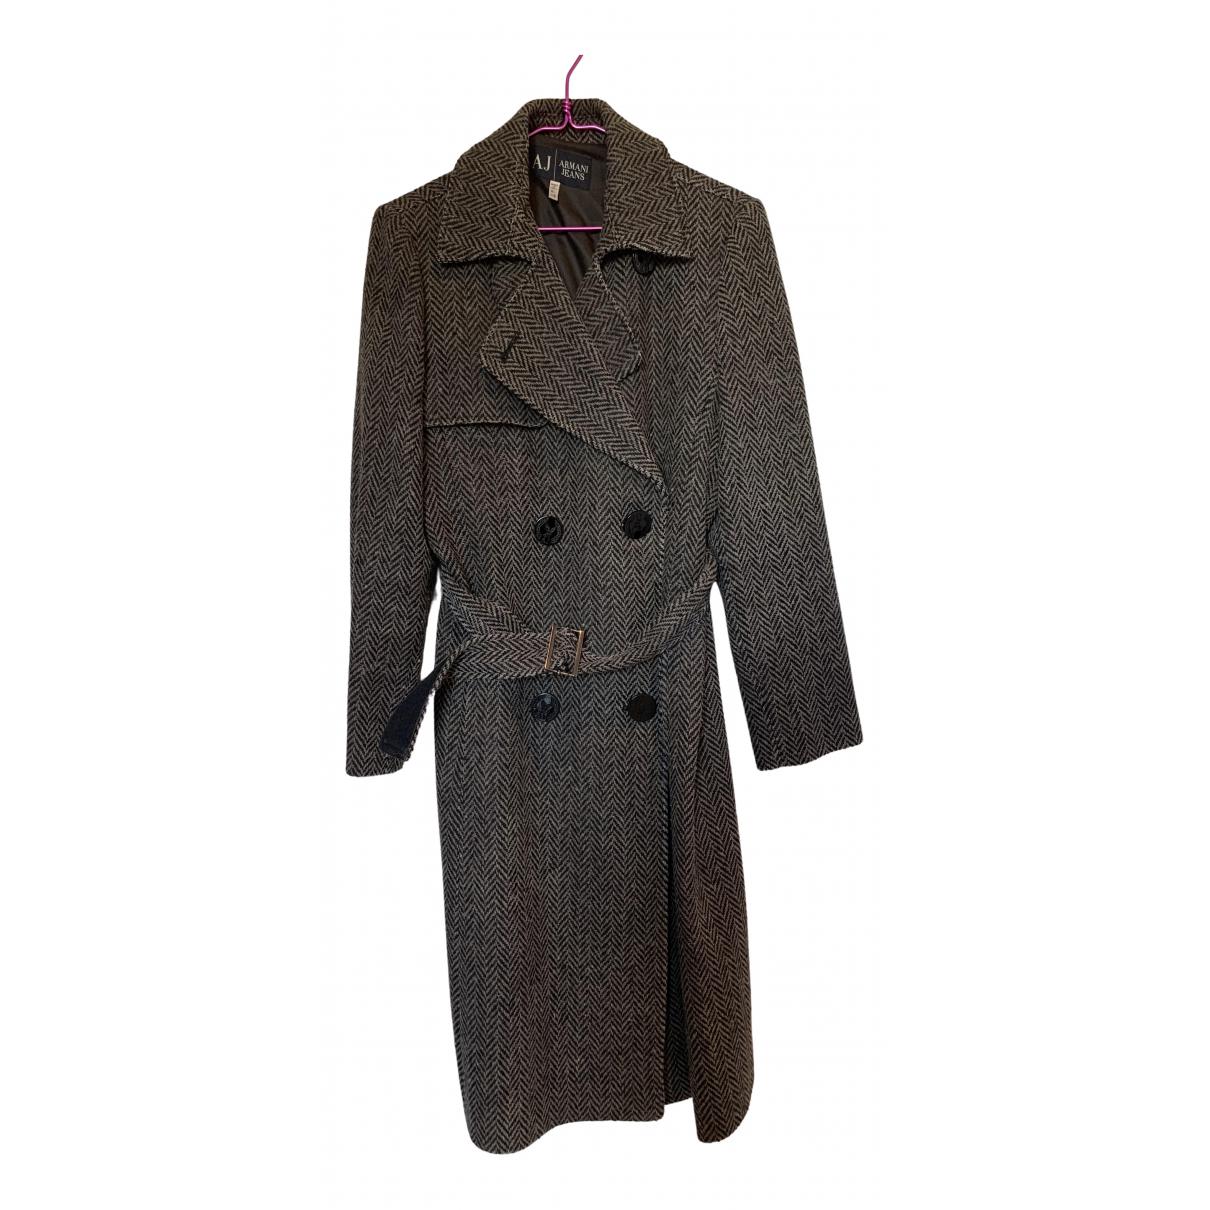 Armani Jeans \N Multicolour Wool coat for Women 4 US